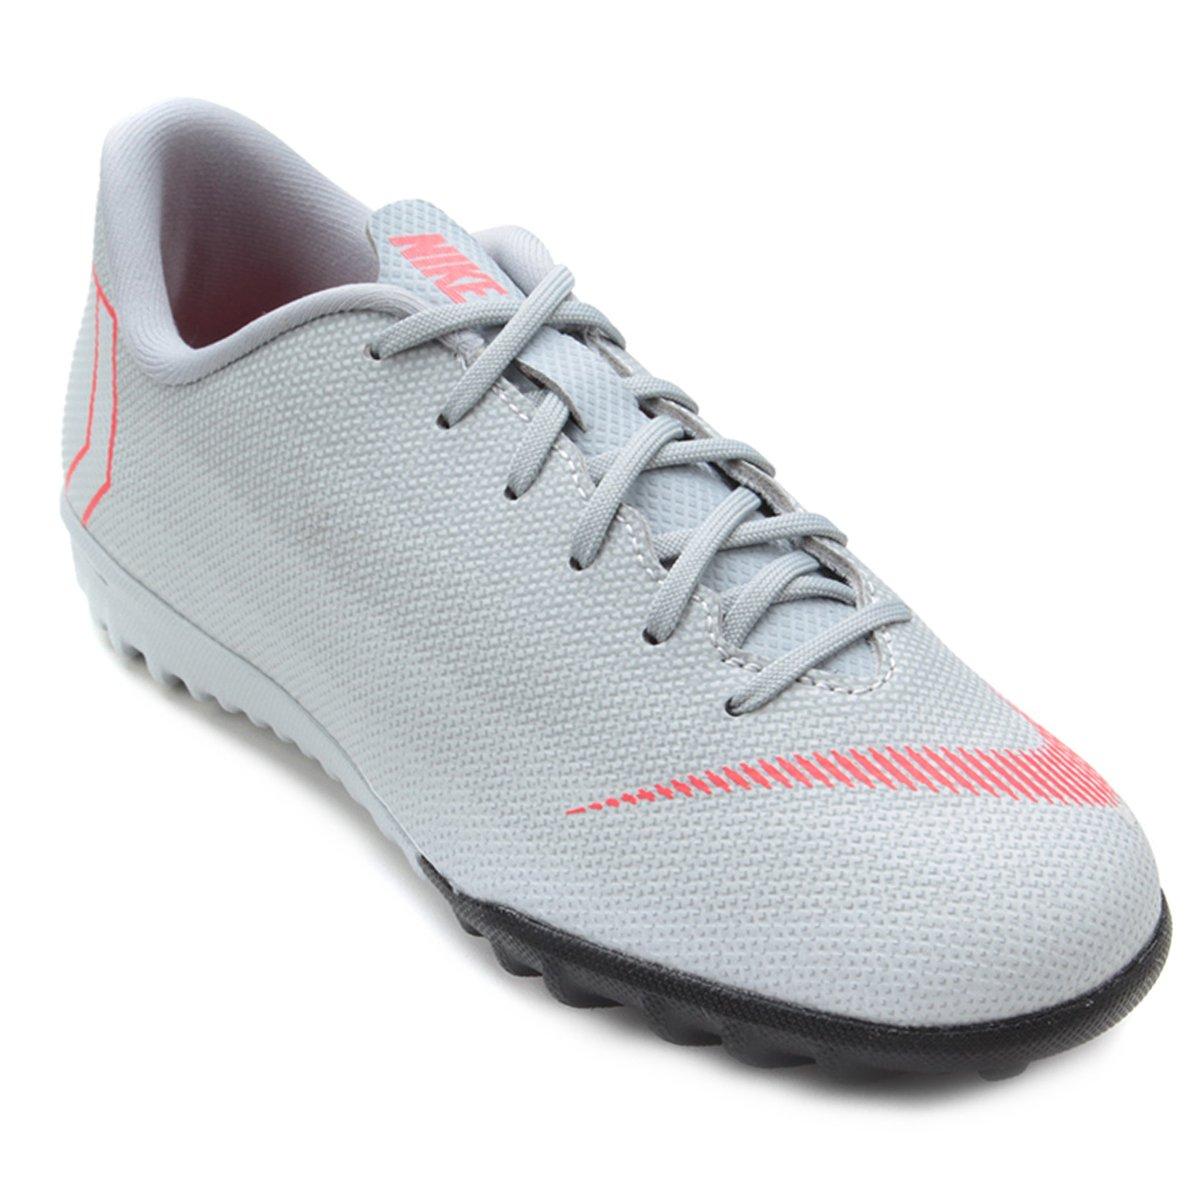 5207cf0b02 Chuteira Society Infantil Nike Mercurial Vapor 12 Academy GS TF - Cinza